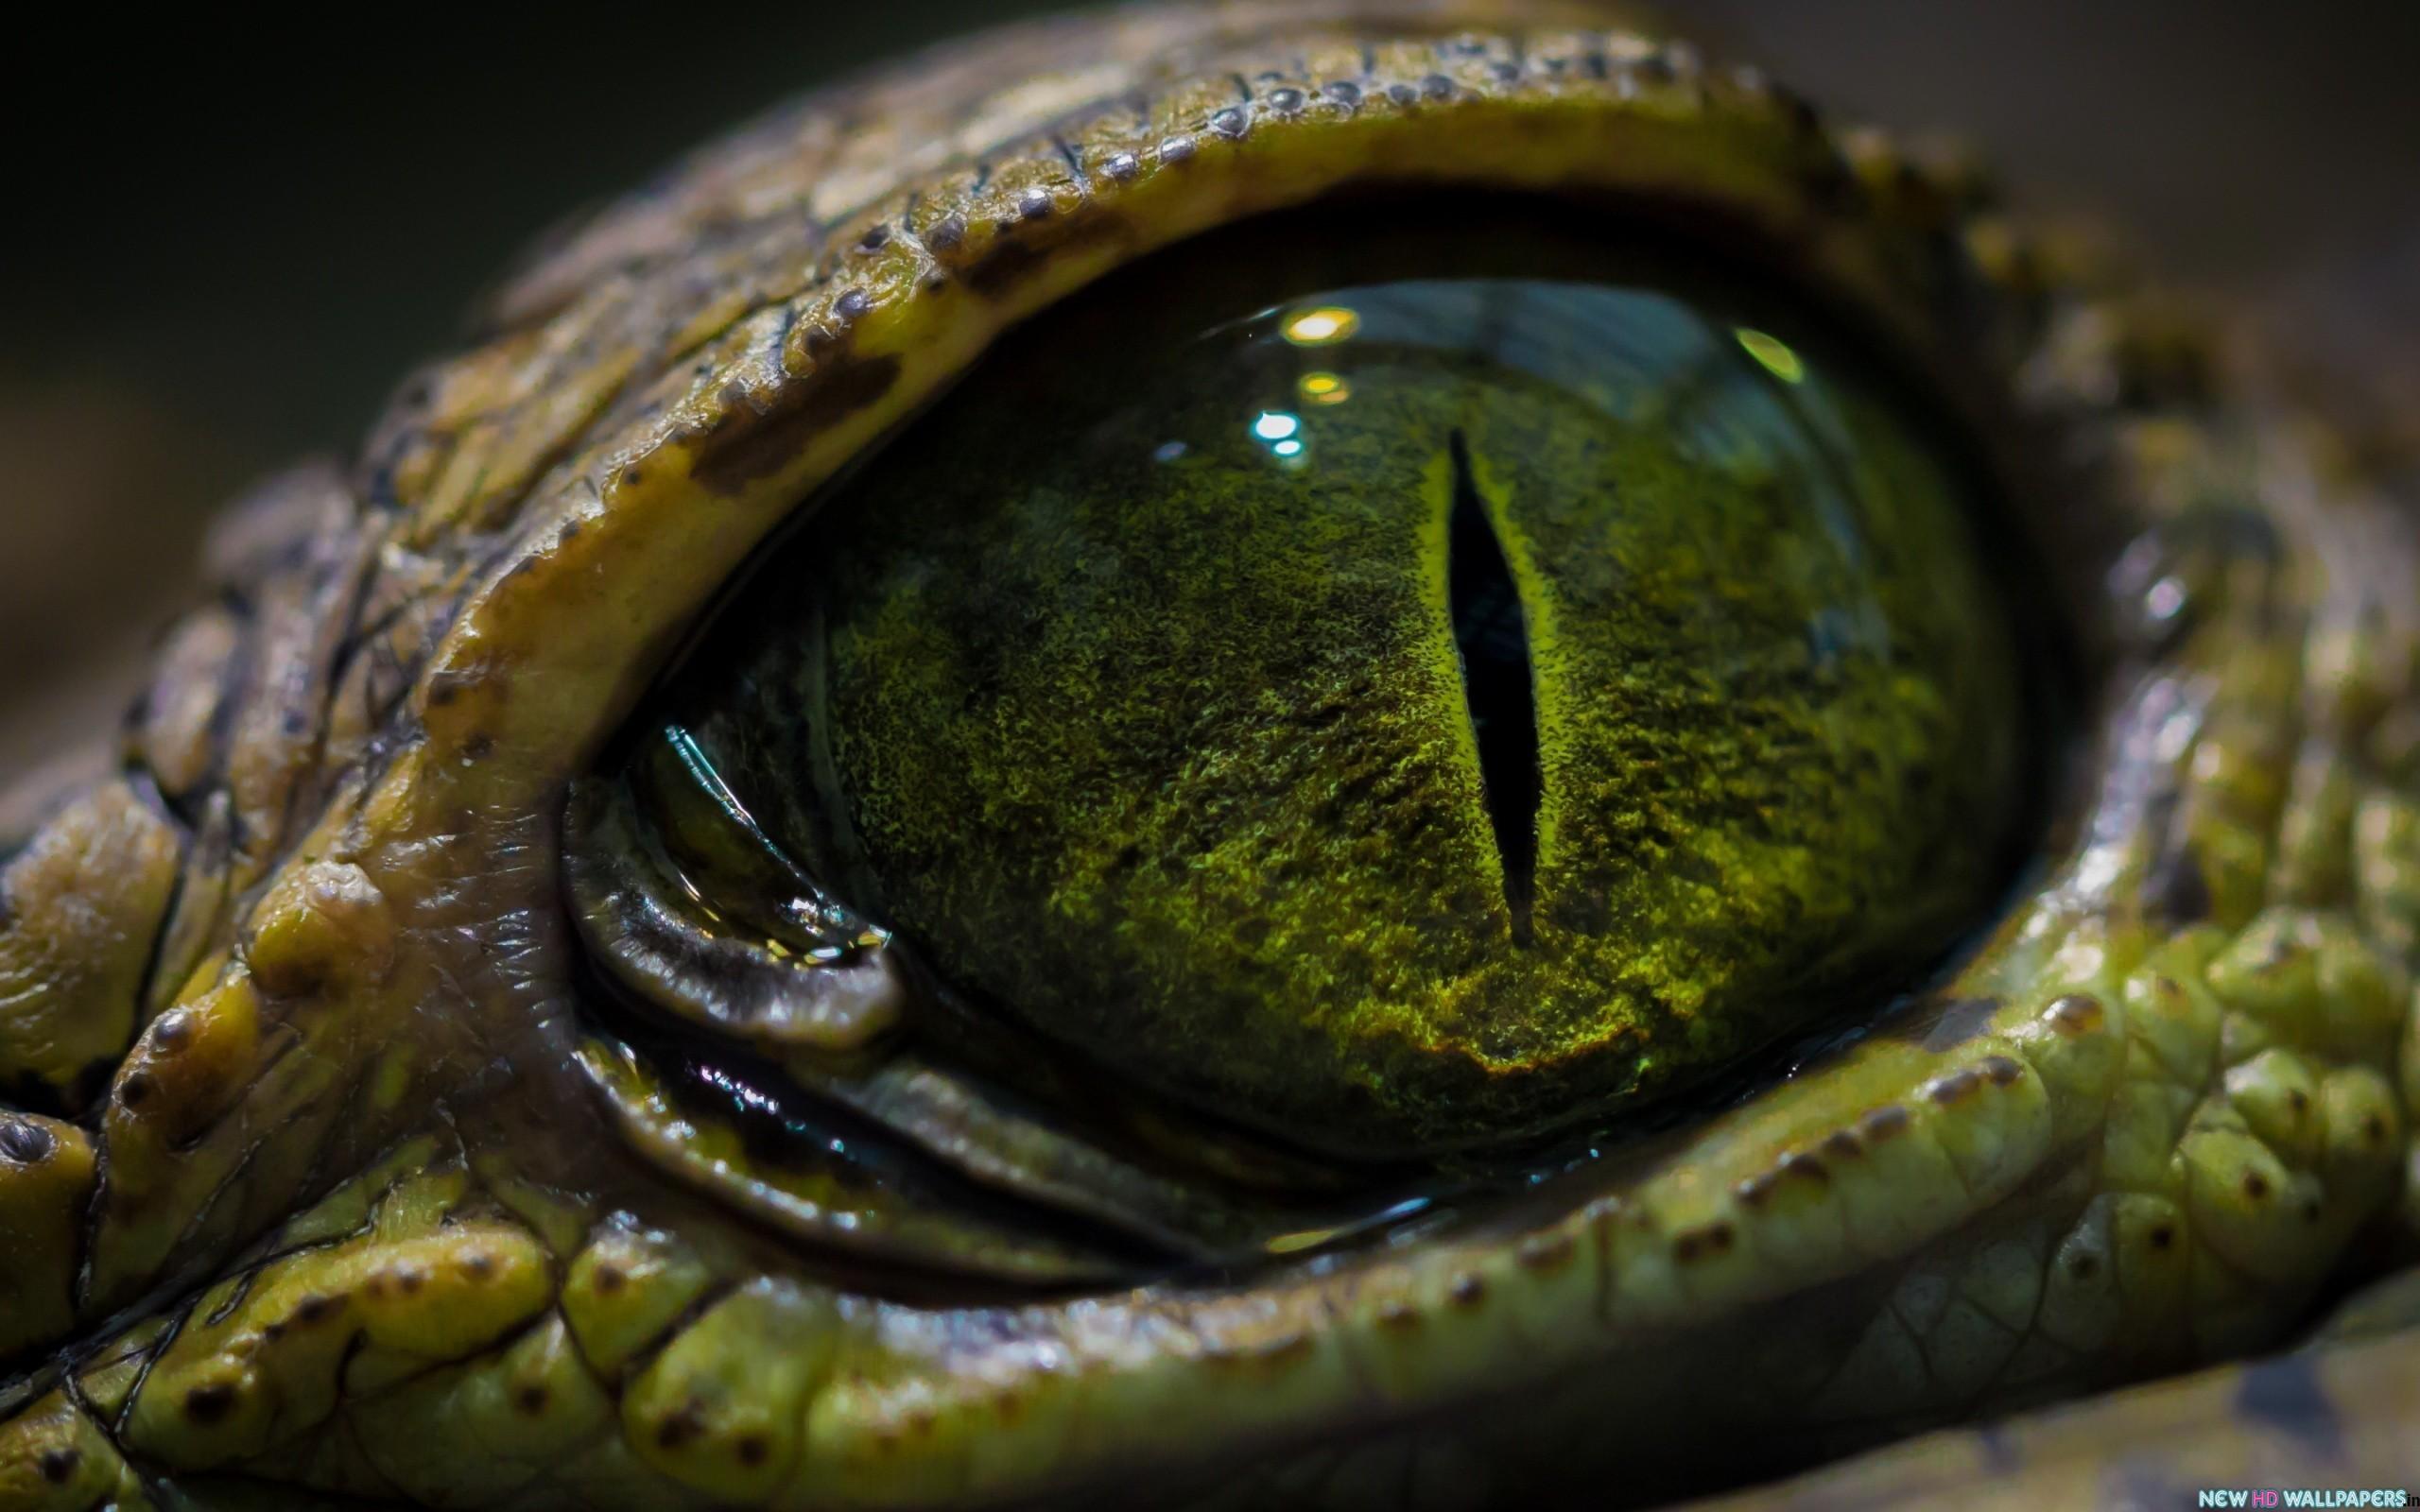 Snake Eyes Wallpaper hd Snake Eye Animal hd Wallpaper